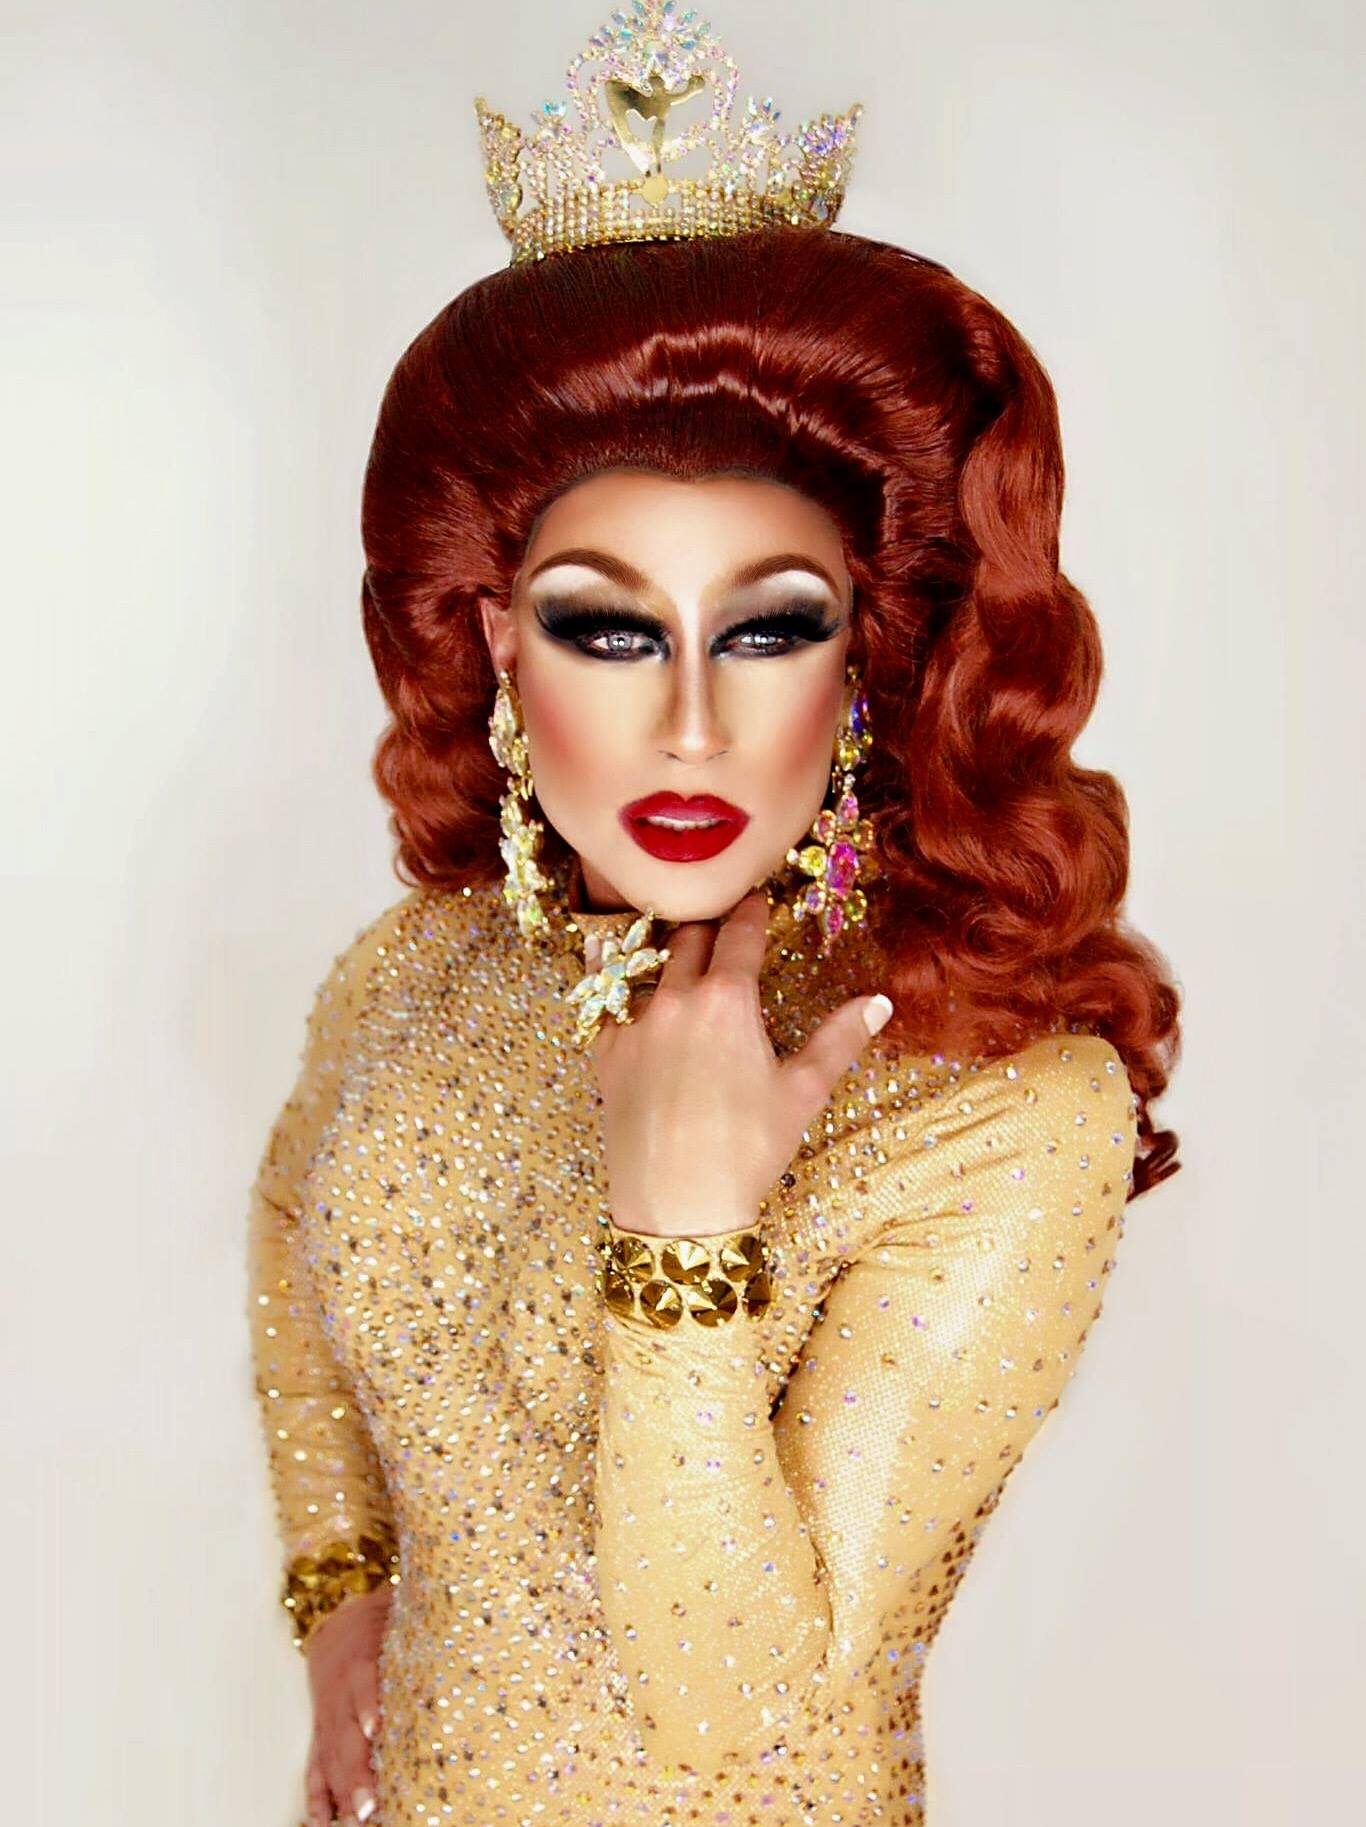 miss gay america deva station